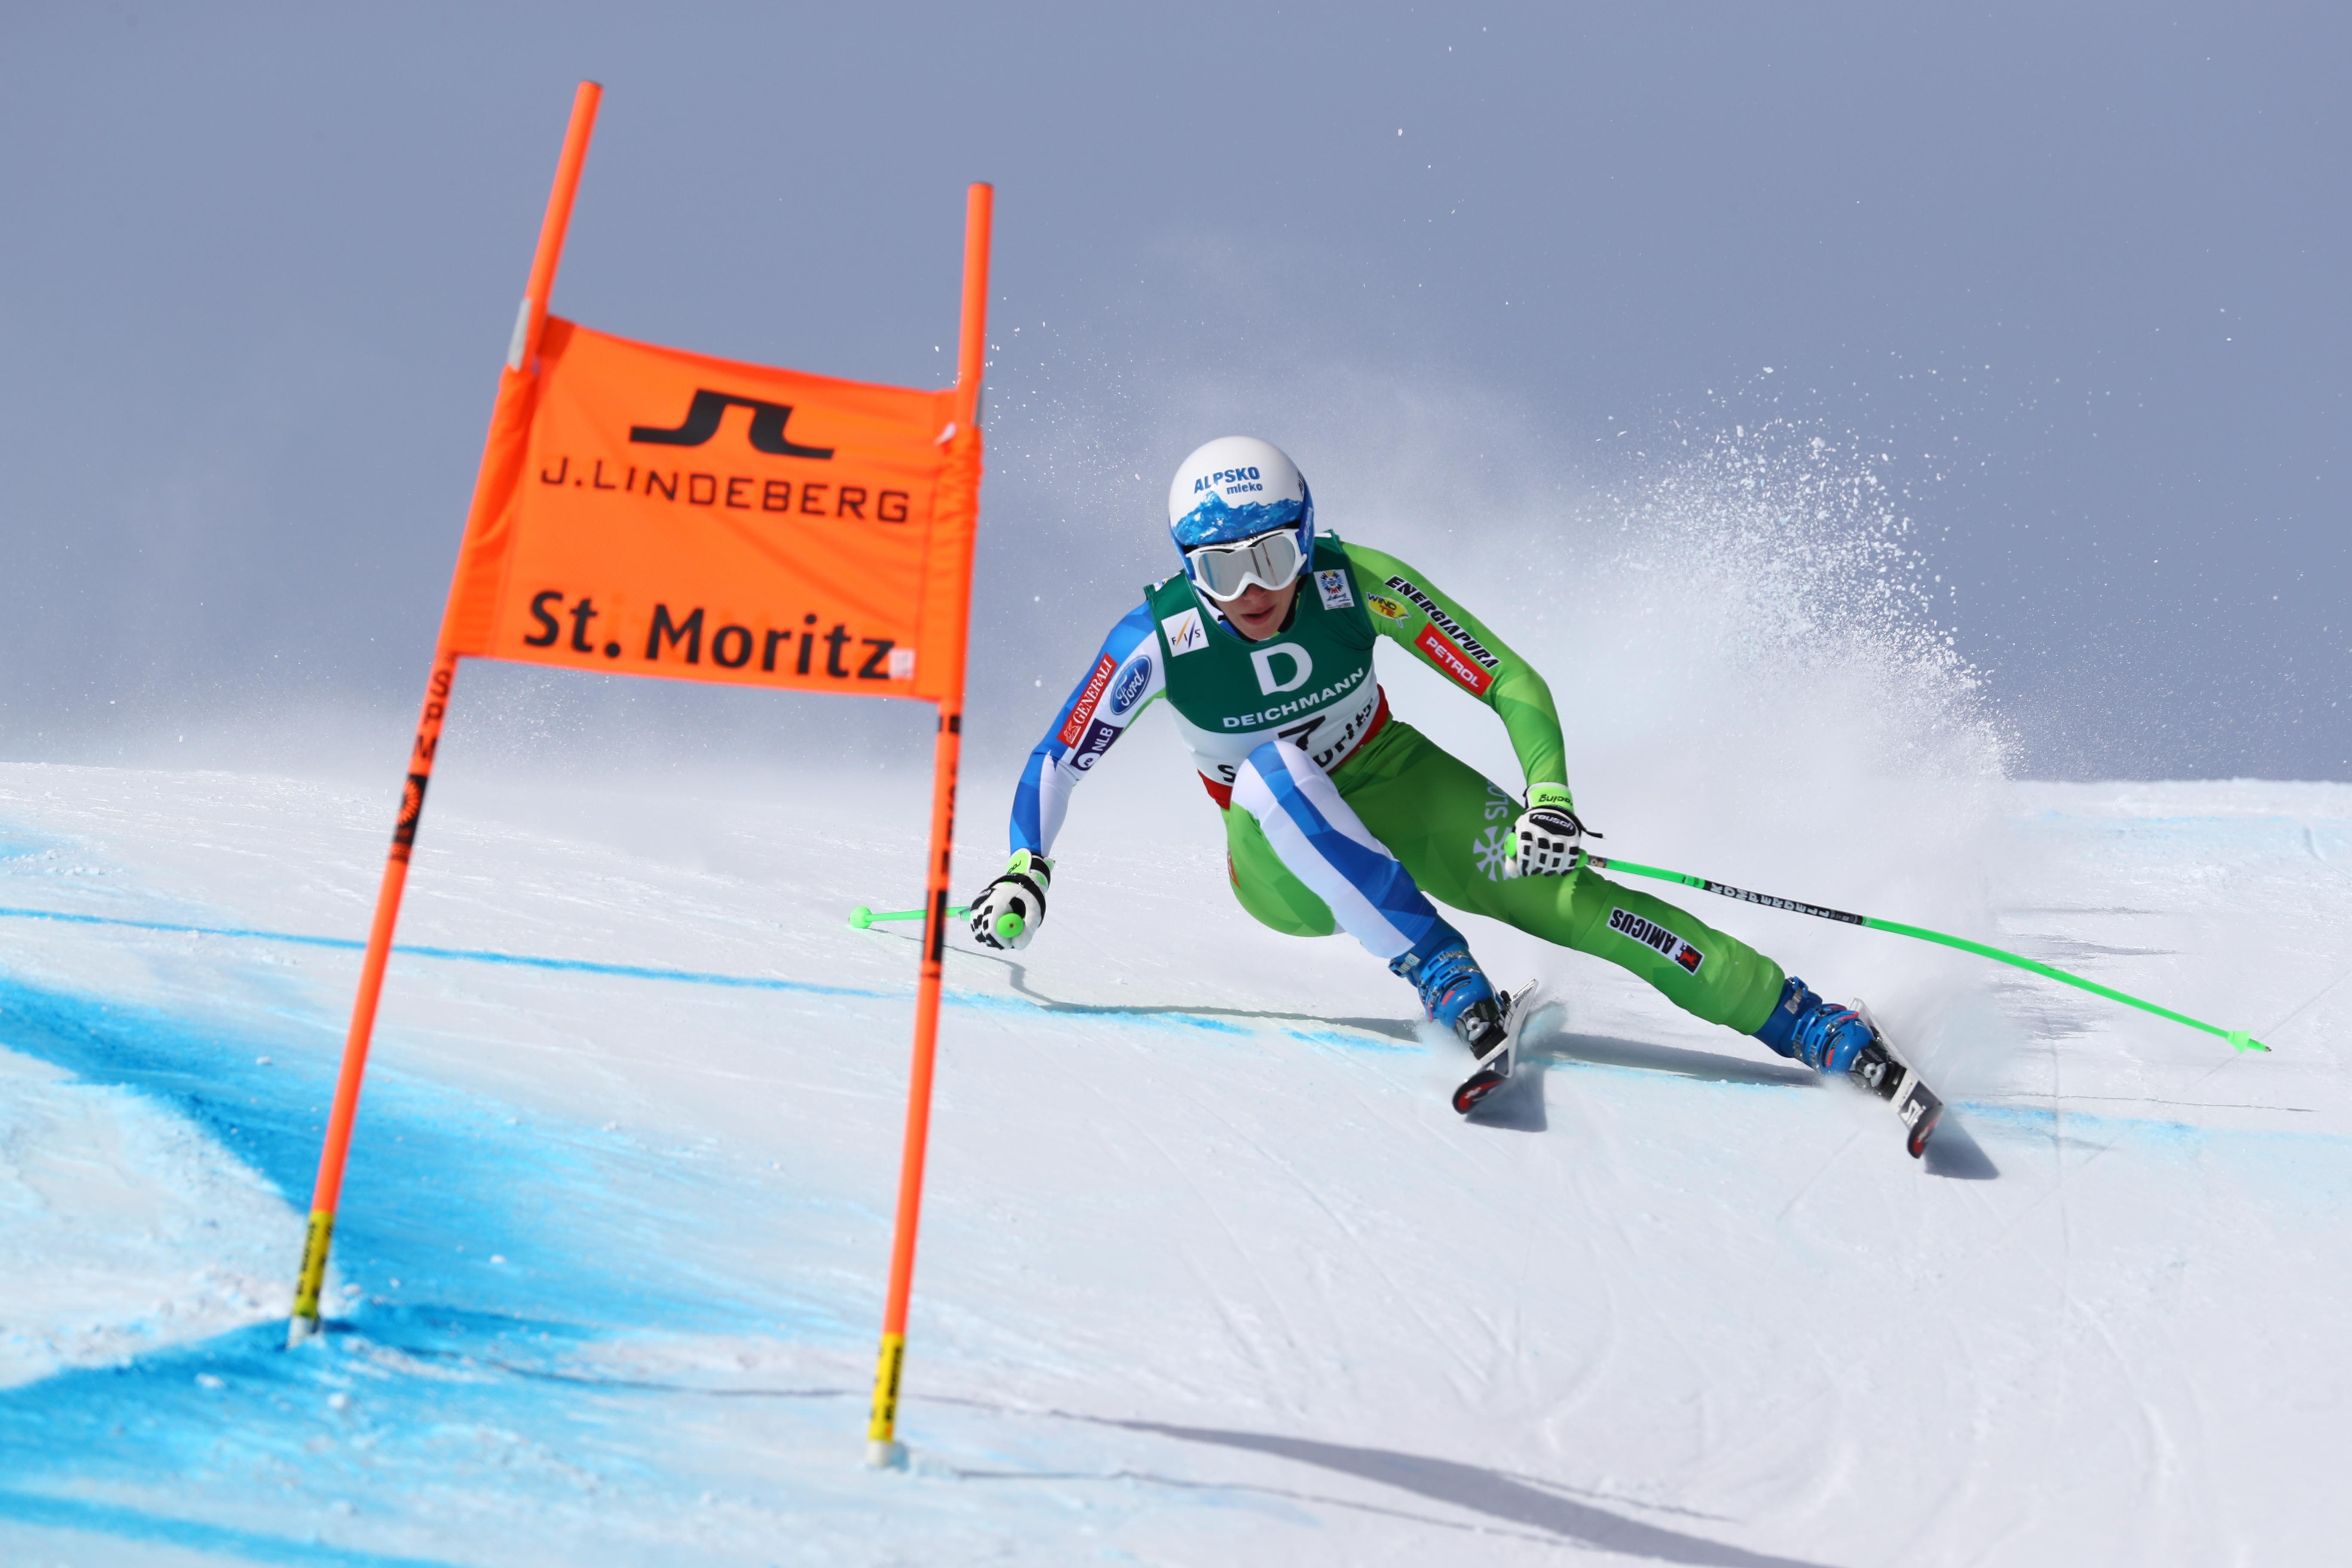 Slovenia's Ilka Stuhec competes during a women's downhill race, at the alpine ski World Championships in St. Moritz, Switzerland, Sunday, Feb.12, 2017. (AP Photo/Alessandro Trovati)